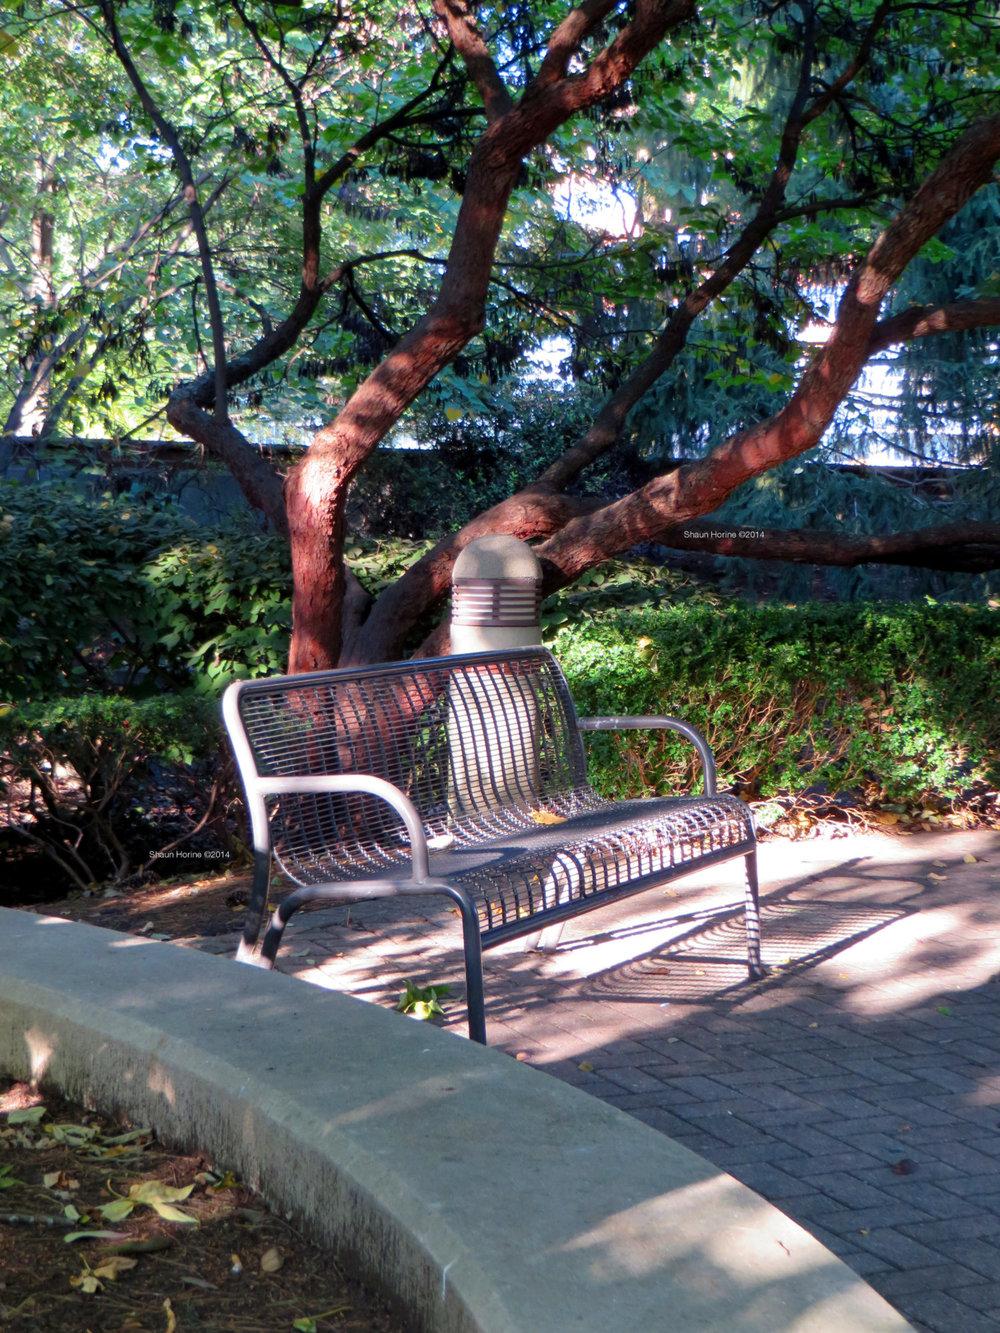 A solo bench under trees in the sunlight. Baptist Hospital Lexington, KY. Canon SX280 HS